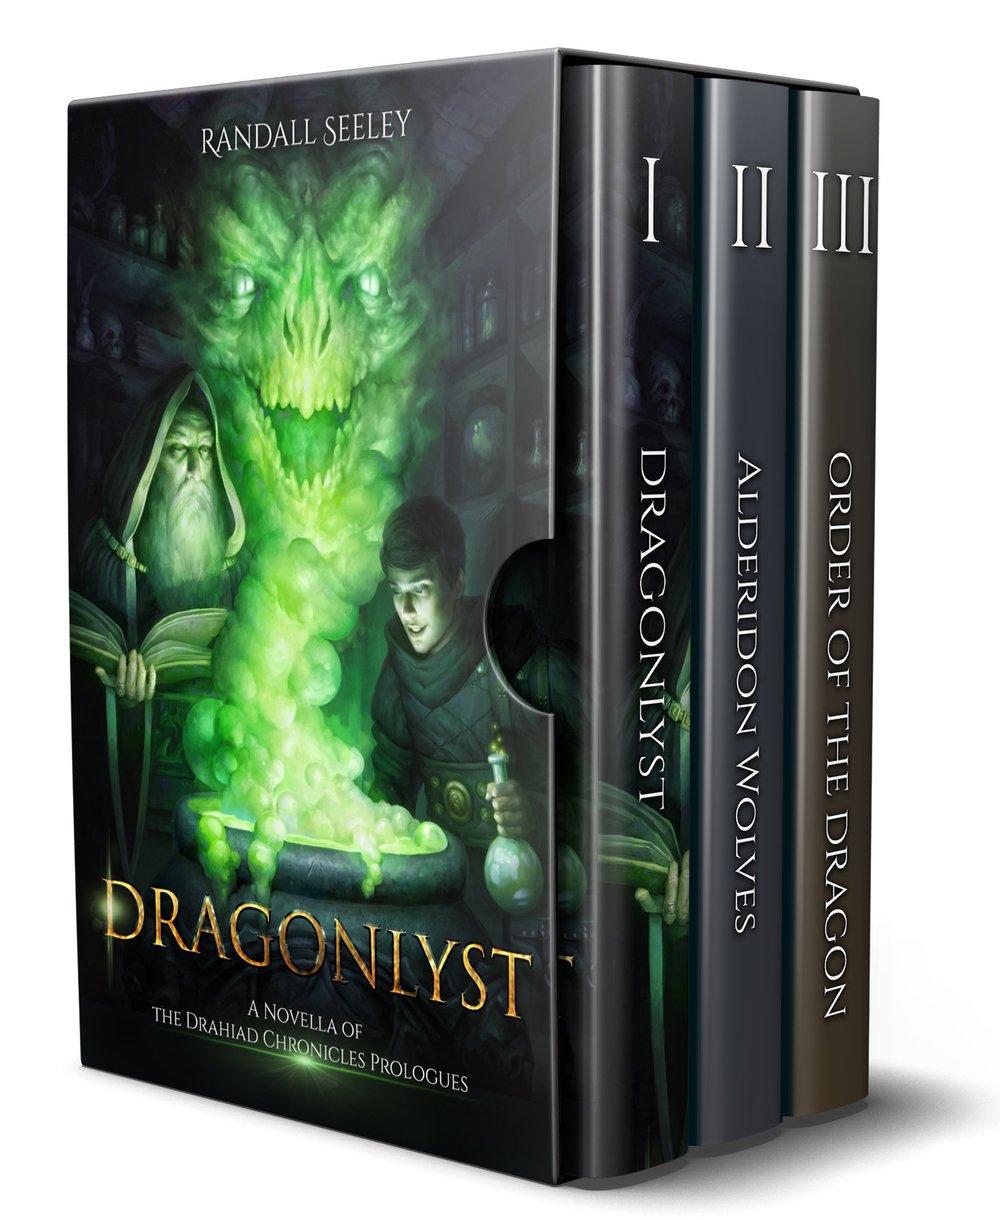 dragonlyst_mockup_3D.jpg